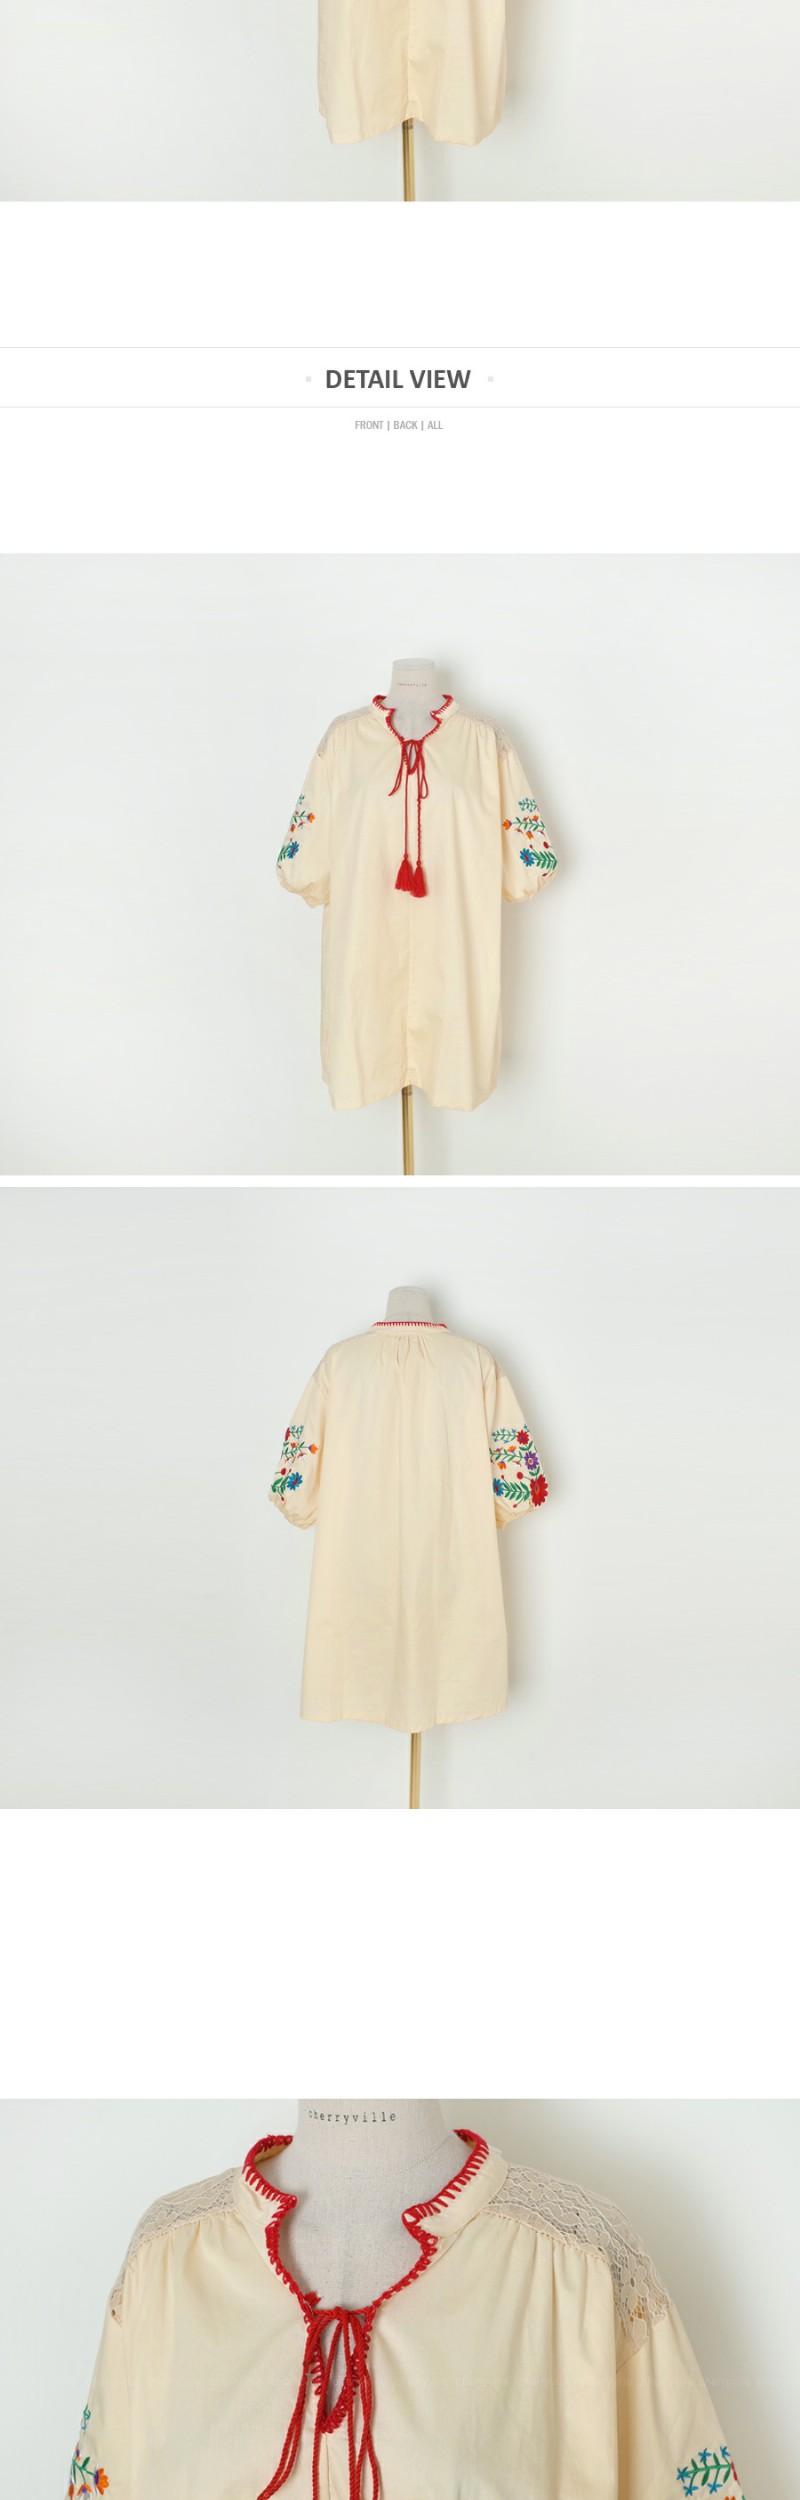 Ethnic Balloon Dress